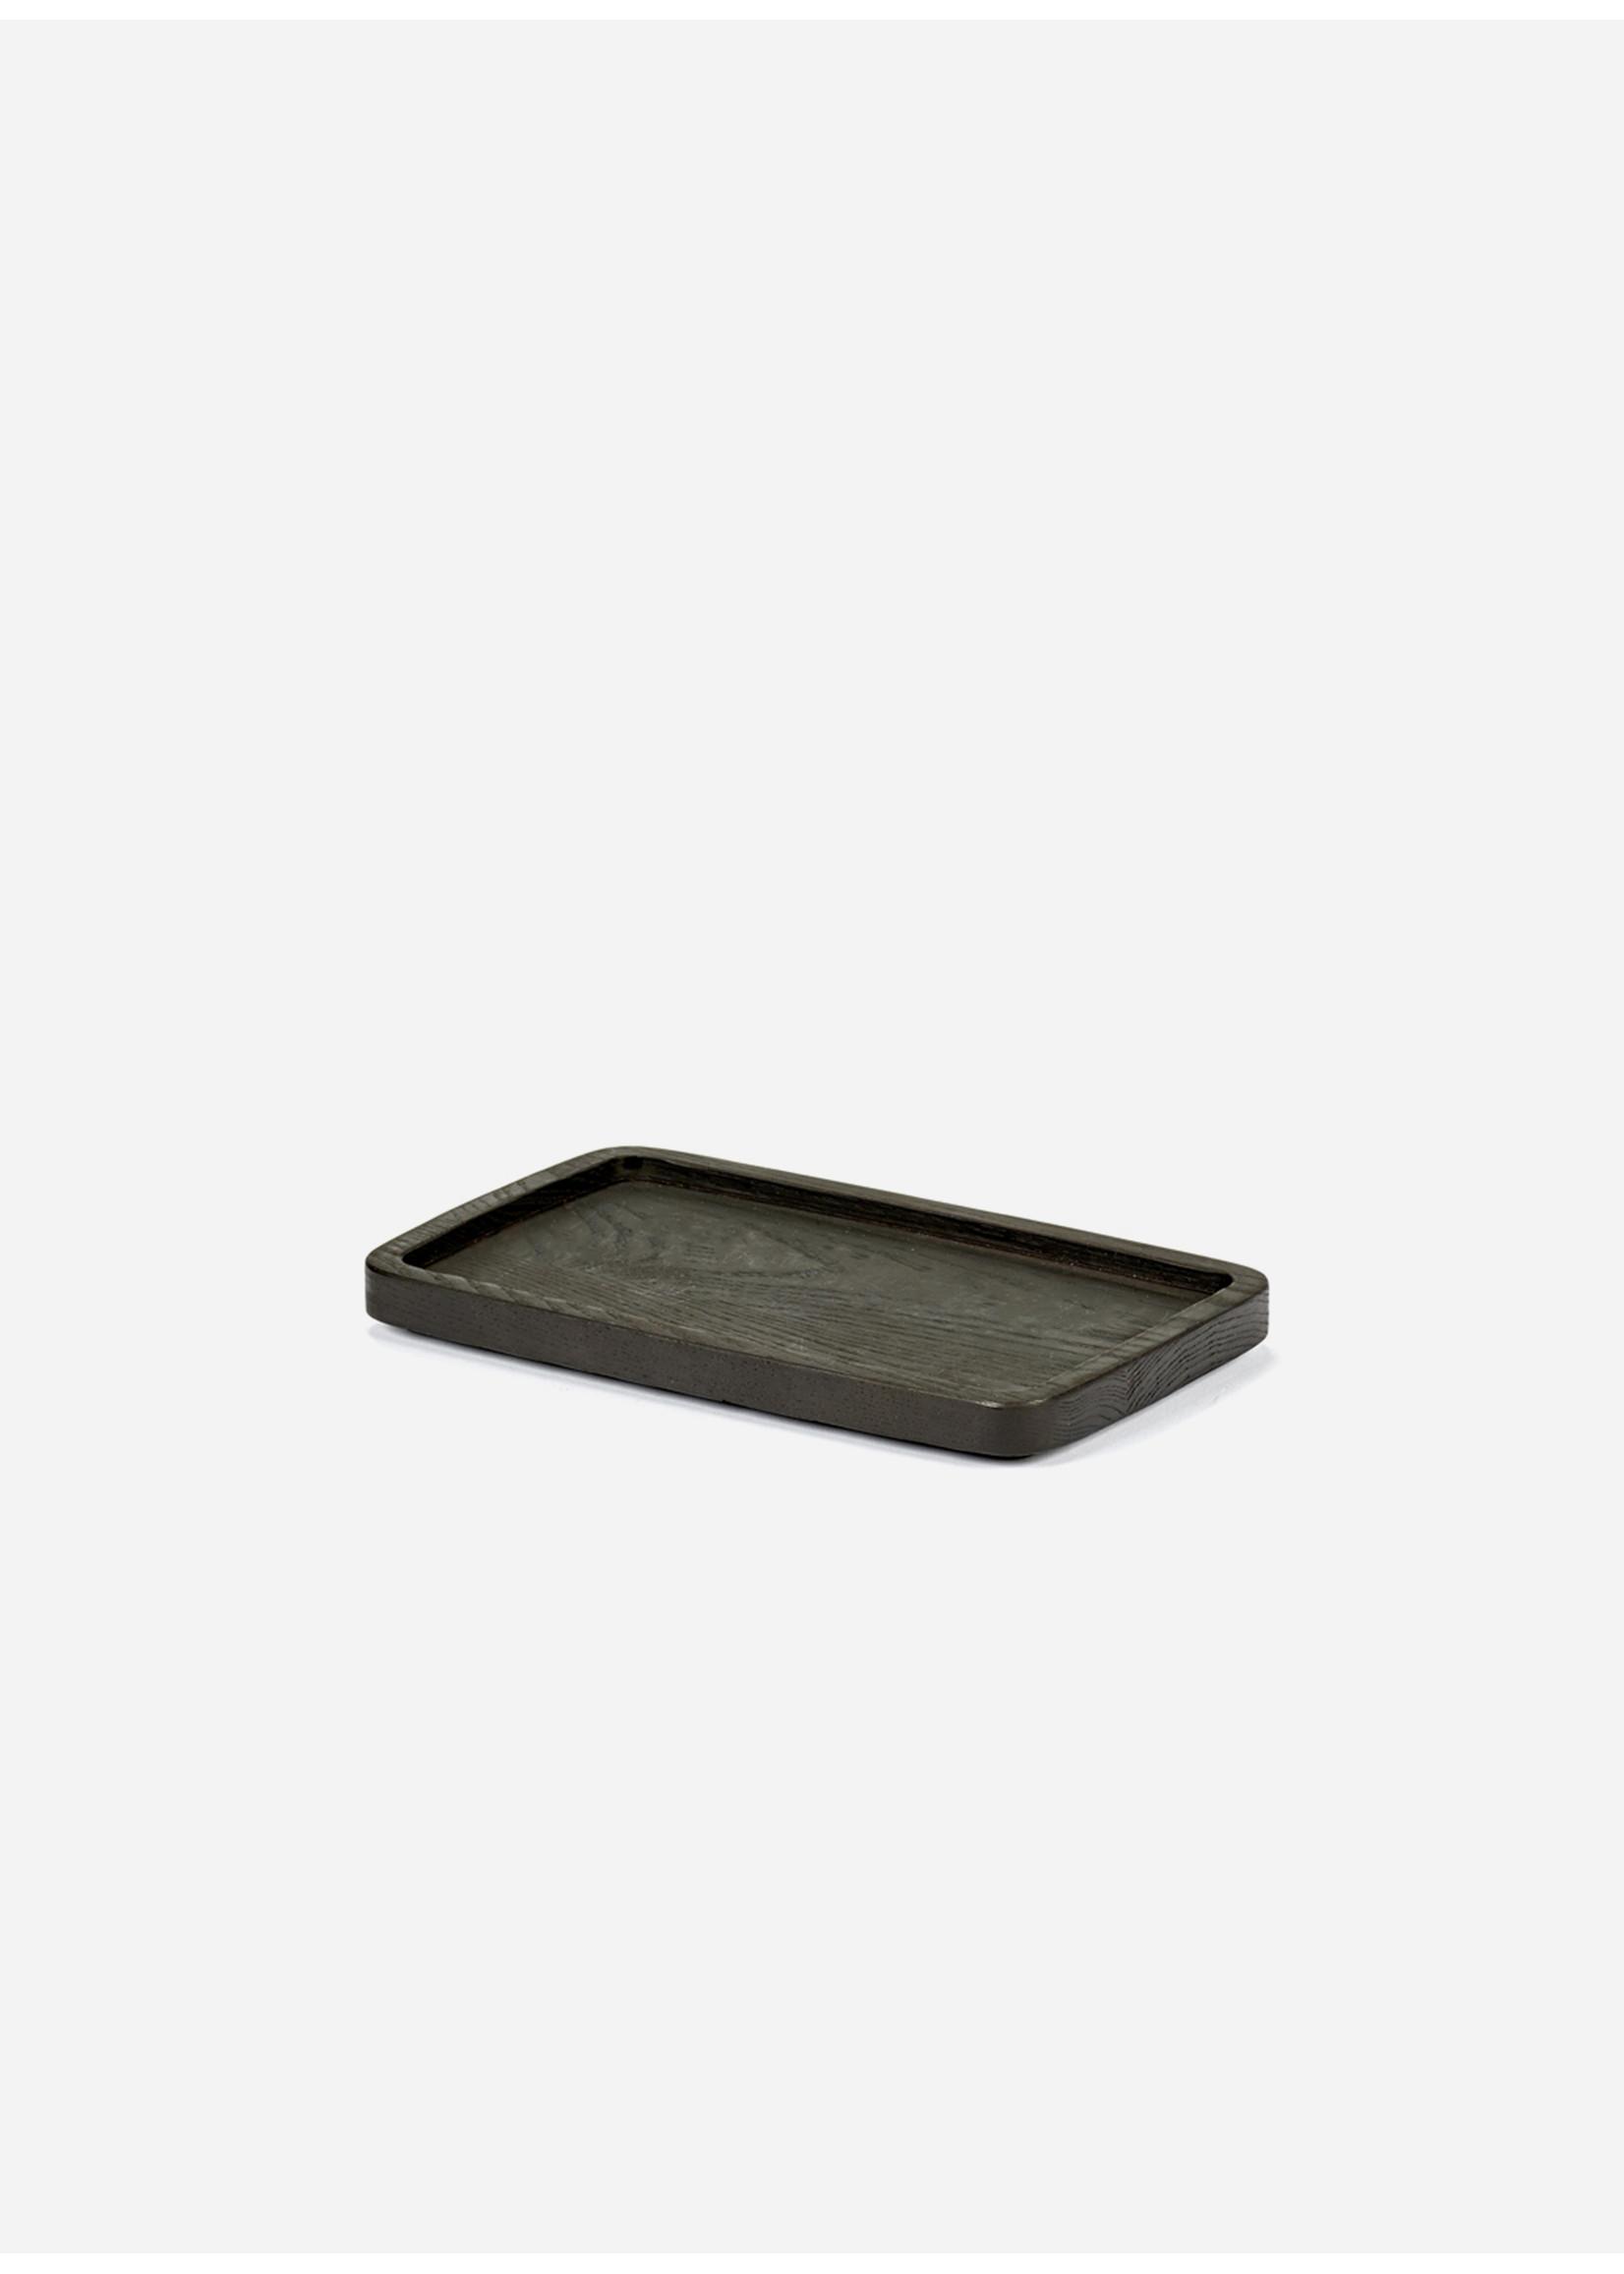 Serax Vincent van Duysen x Serax coaster tray s wood